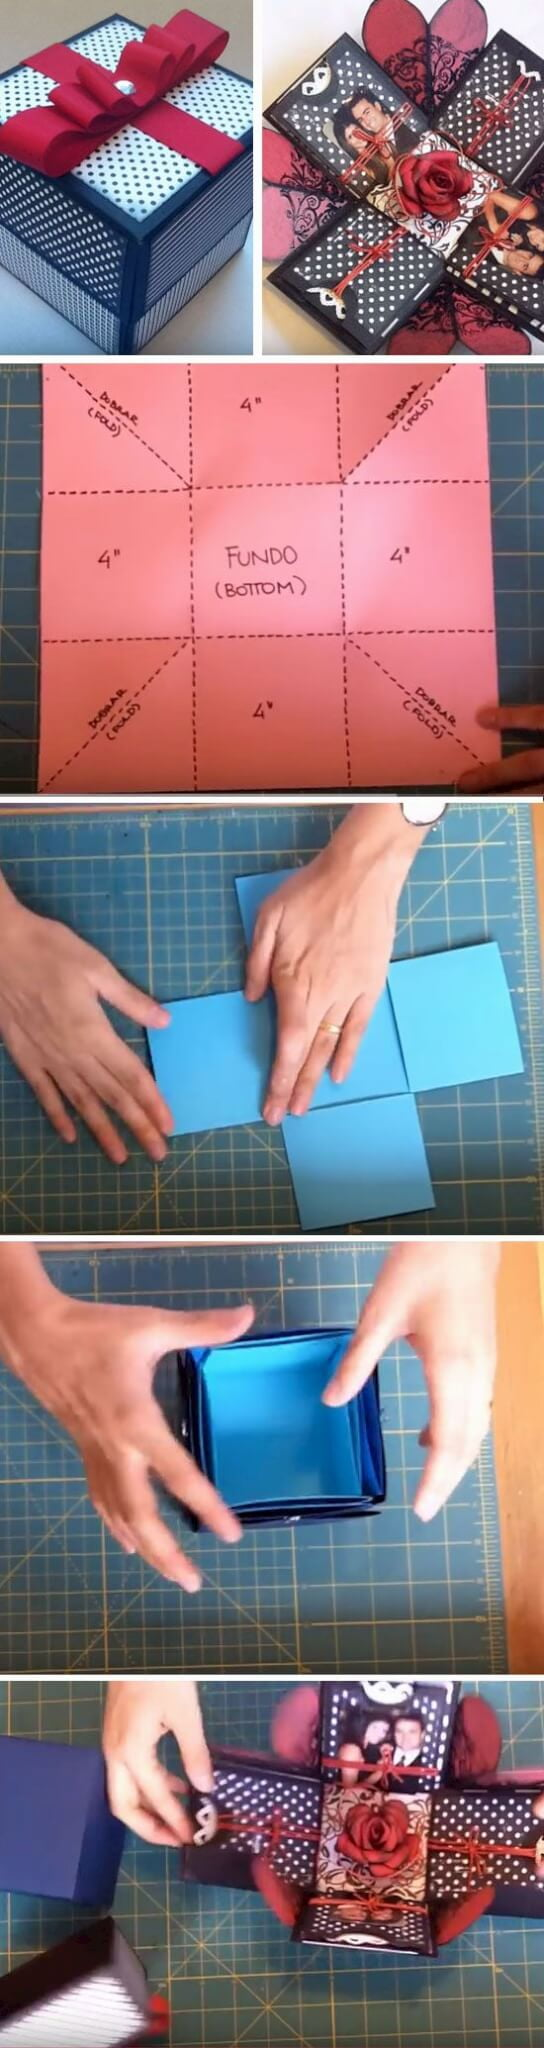 hediye Kutusu Hazırlama-3